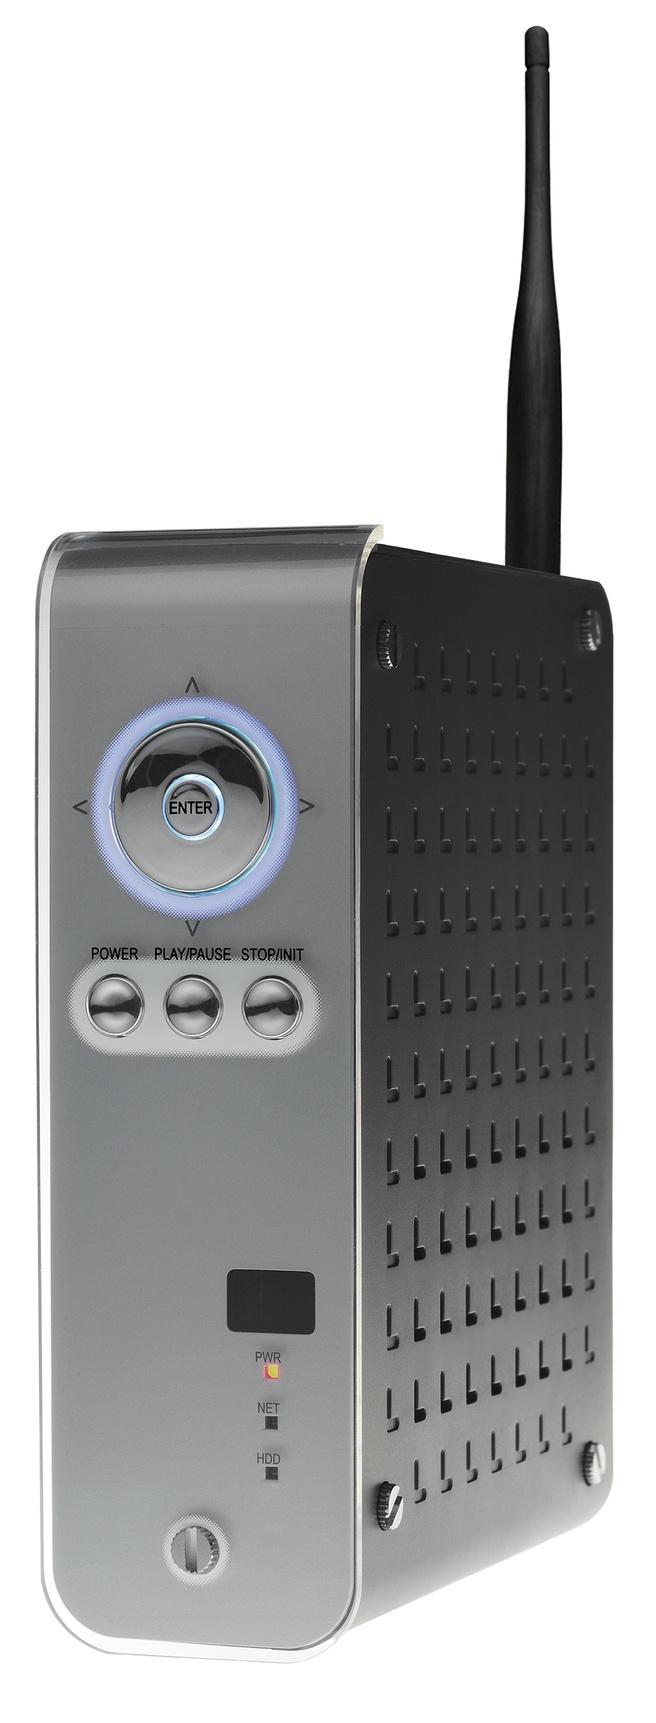 Freecom Network MediaPlayer-350 Wlan 500GB , 500GB